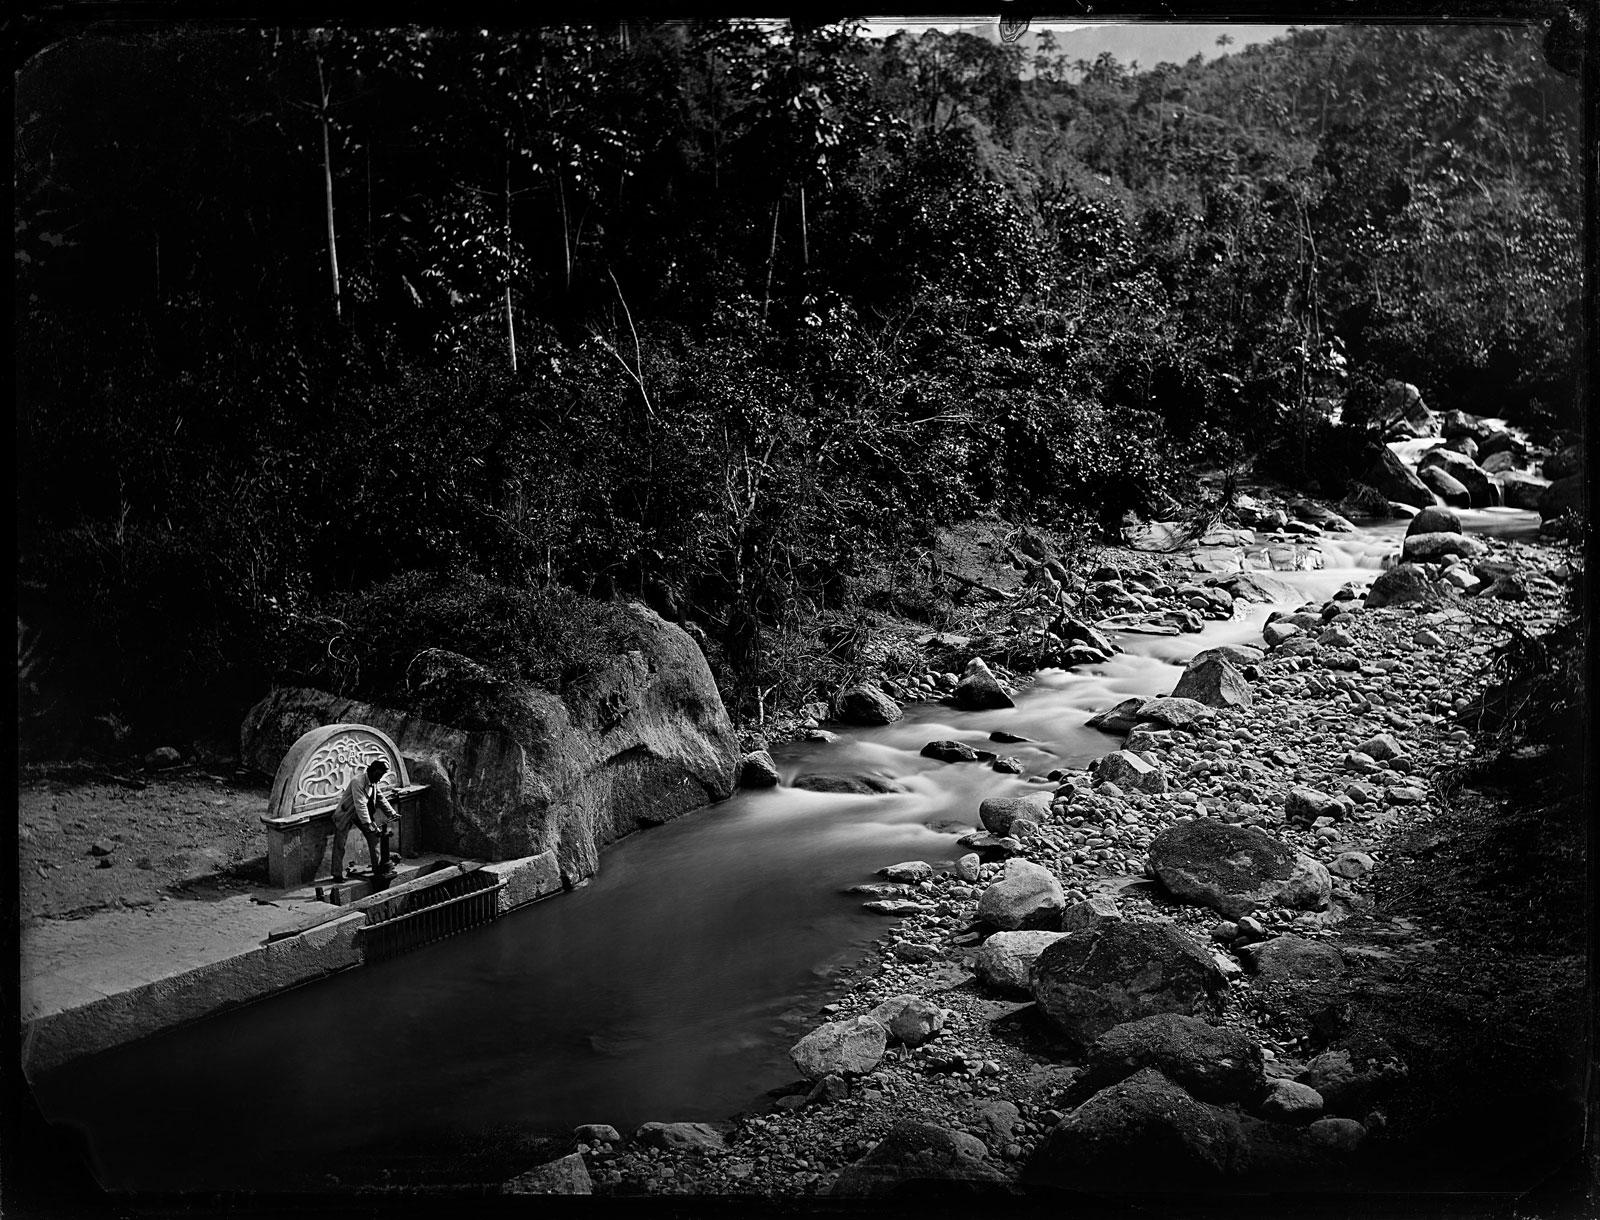 Water supply works, Rio d'ouro dam, circa 1888